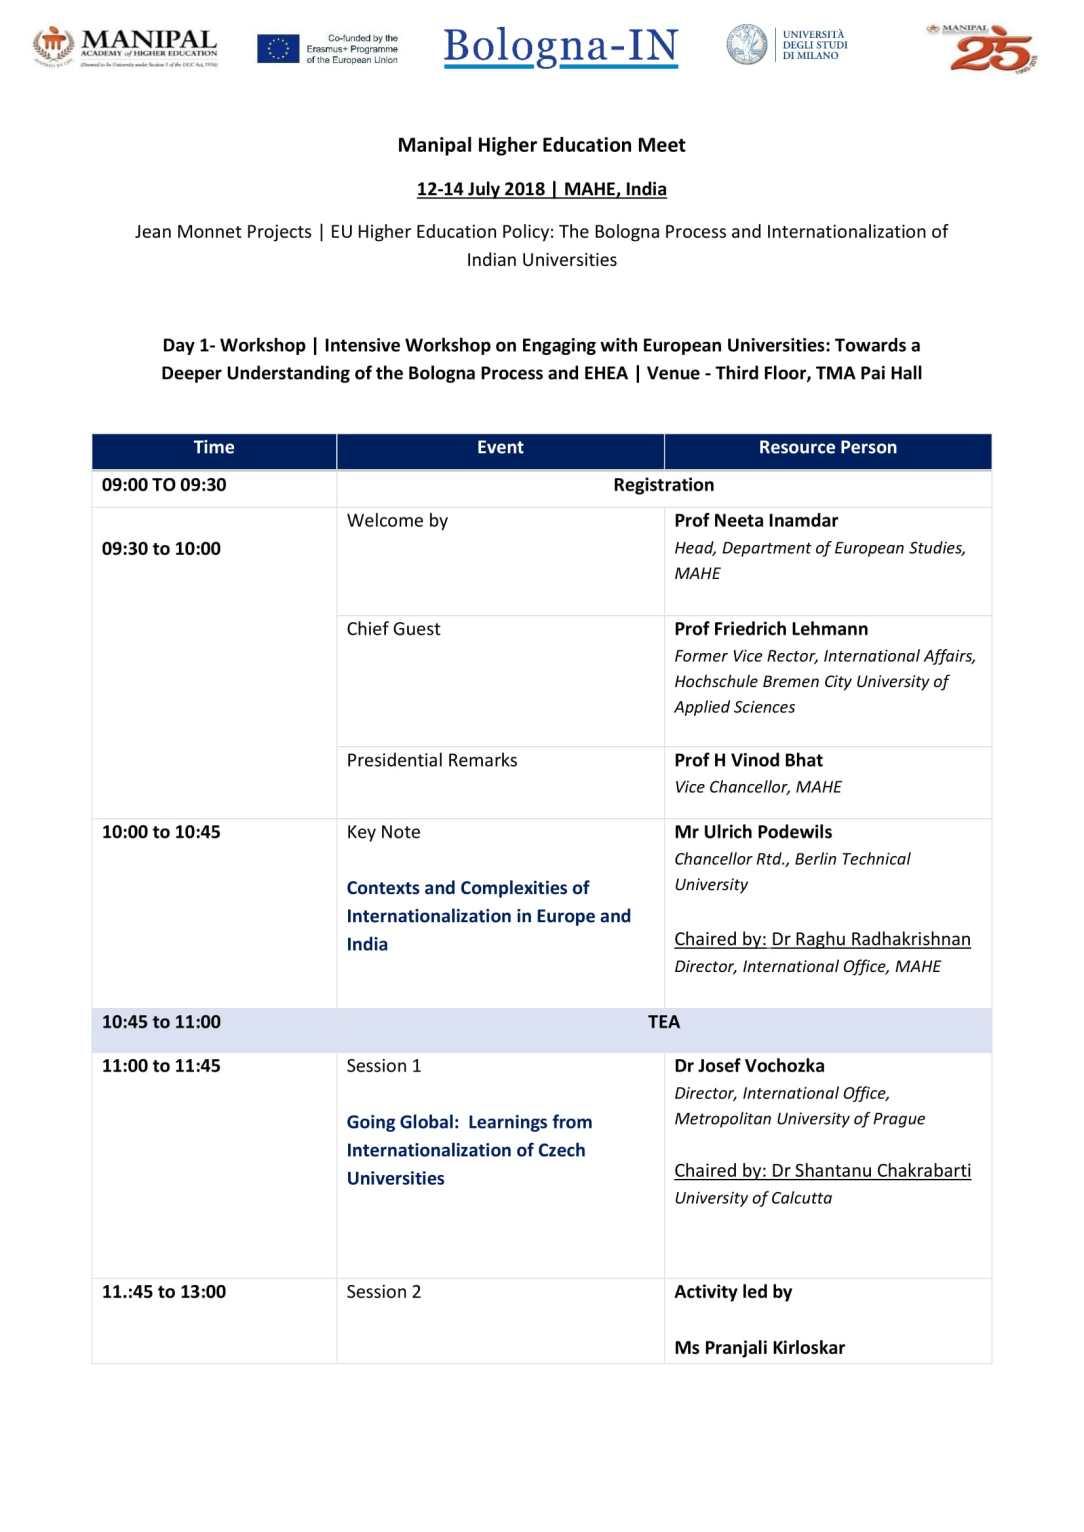 MHEM- Program Schedule-1